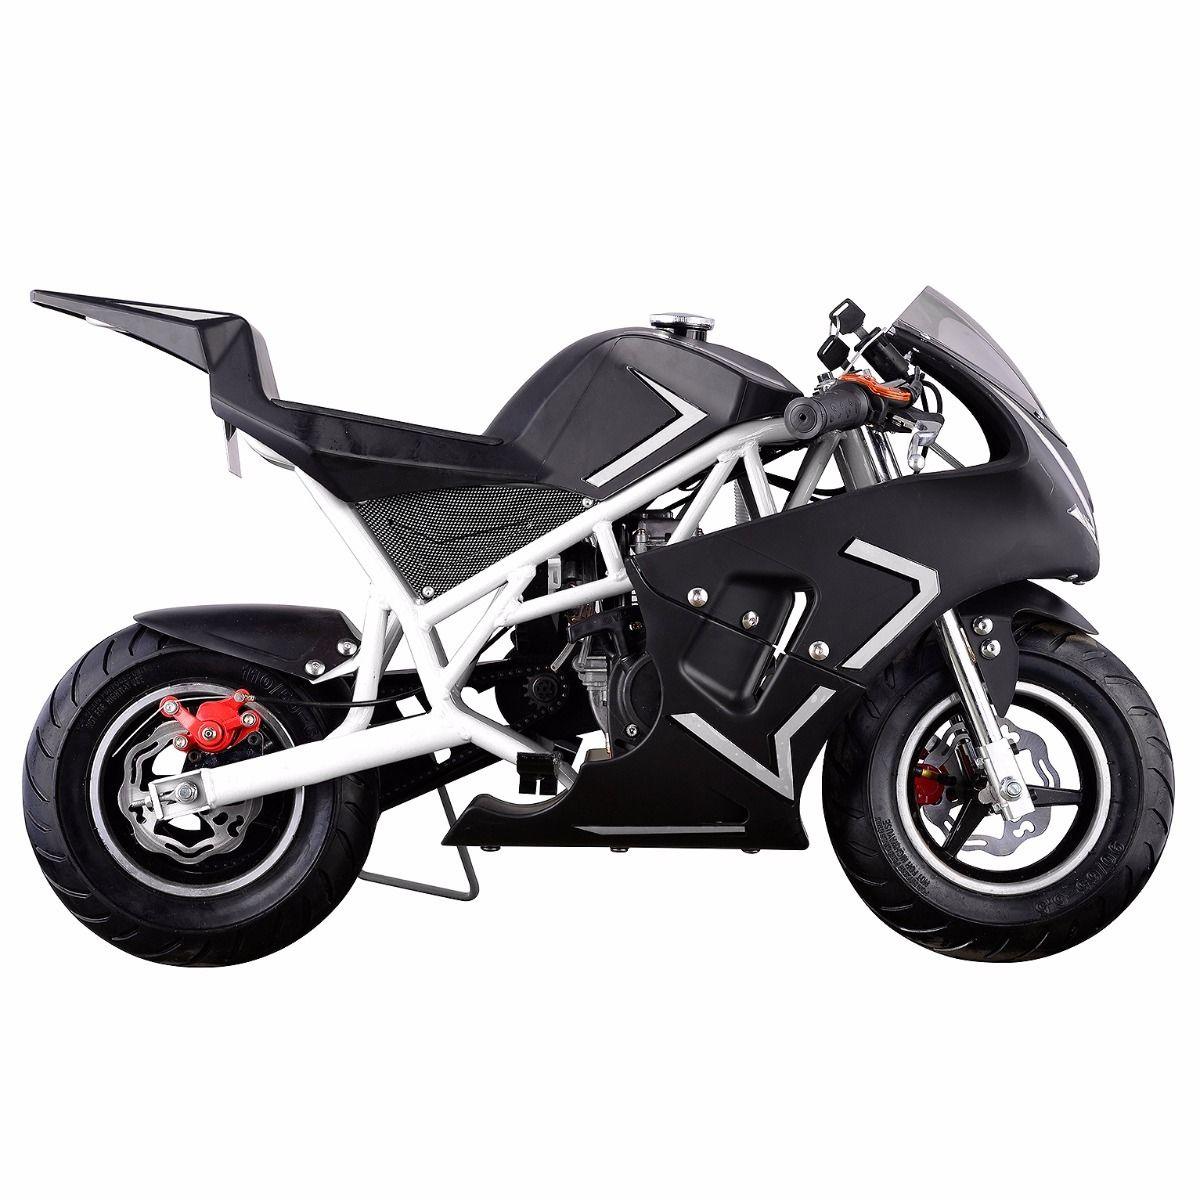 XtremepowerUS-Gas-Pocket-Bike-Motor-Bike-Scooter-40cc-Epa-Engine-Motorcycle thumbnail 31